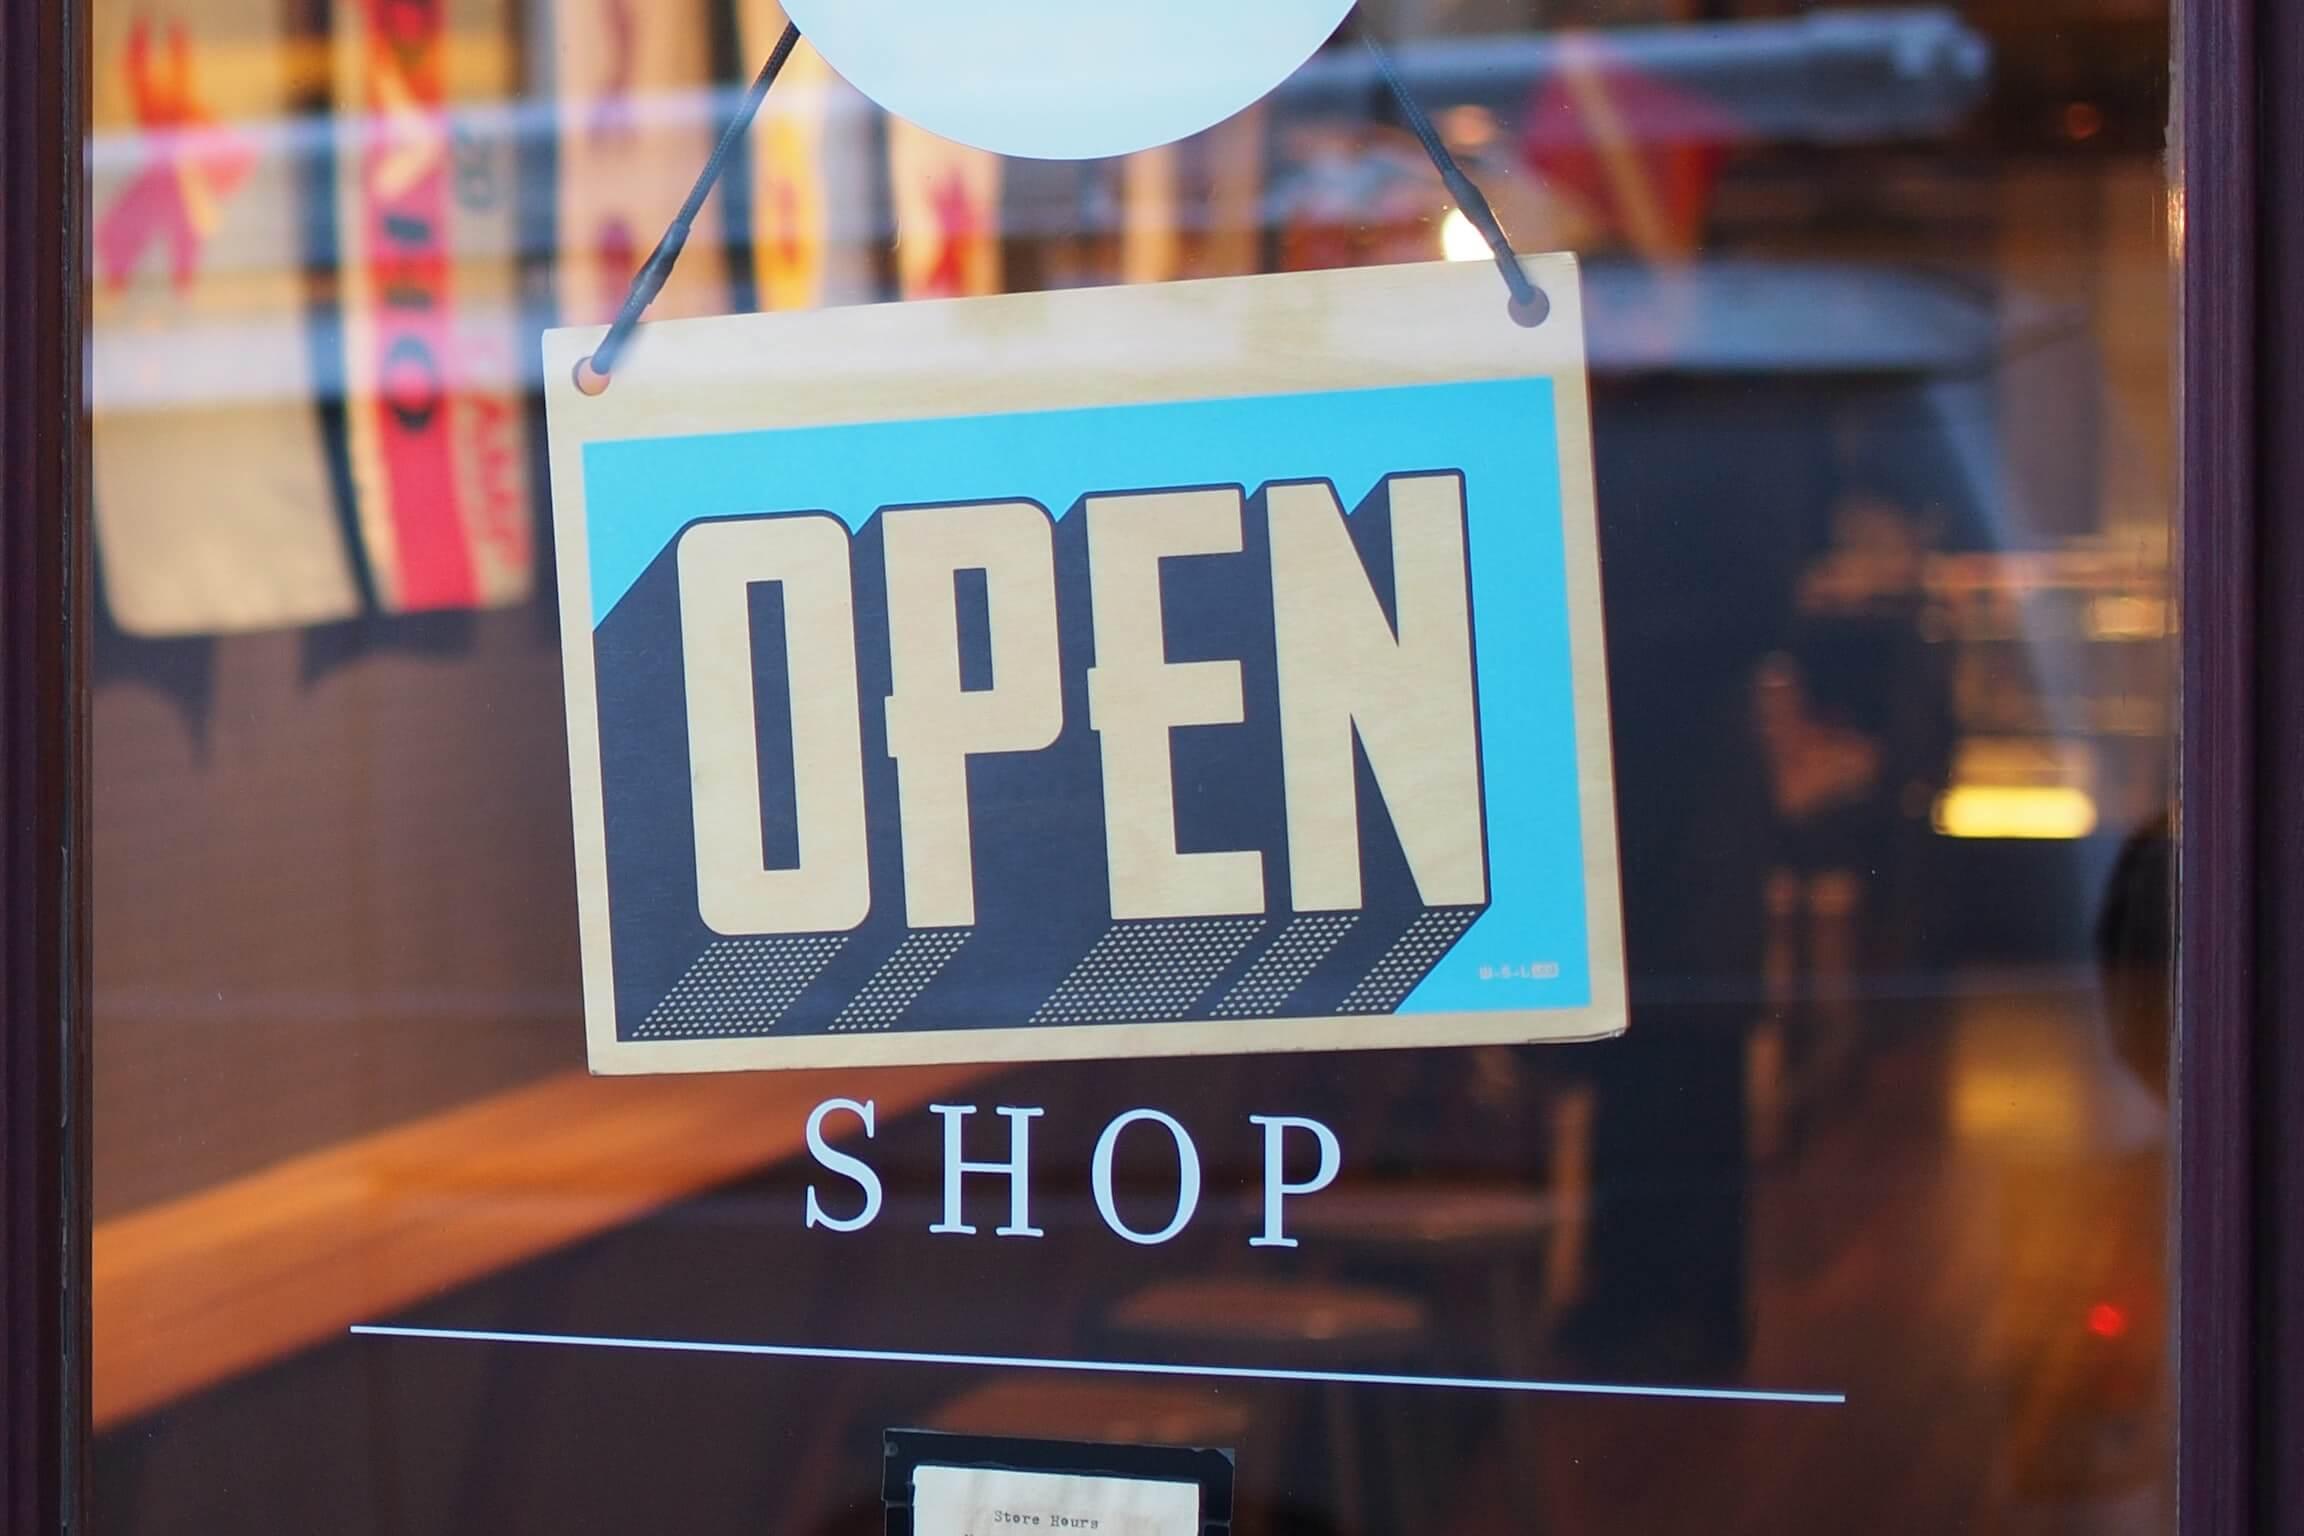 mike-petrucci-c9FQyqIECds-unsplash 店舗の売り上げを改善したい!店舗デザインの見直しのタイミングです